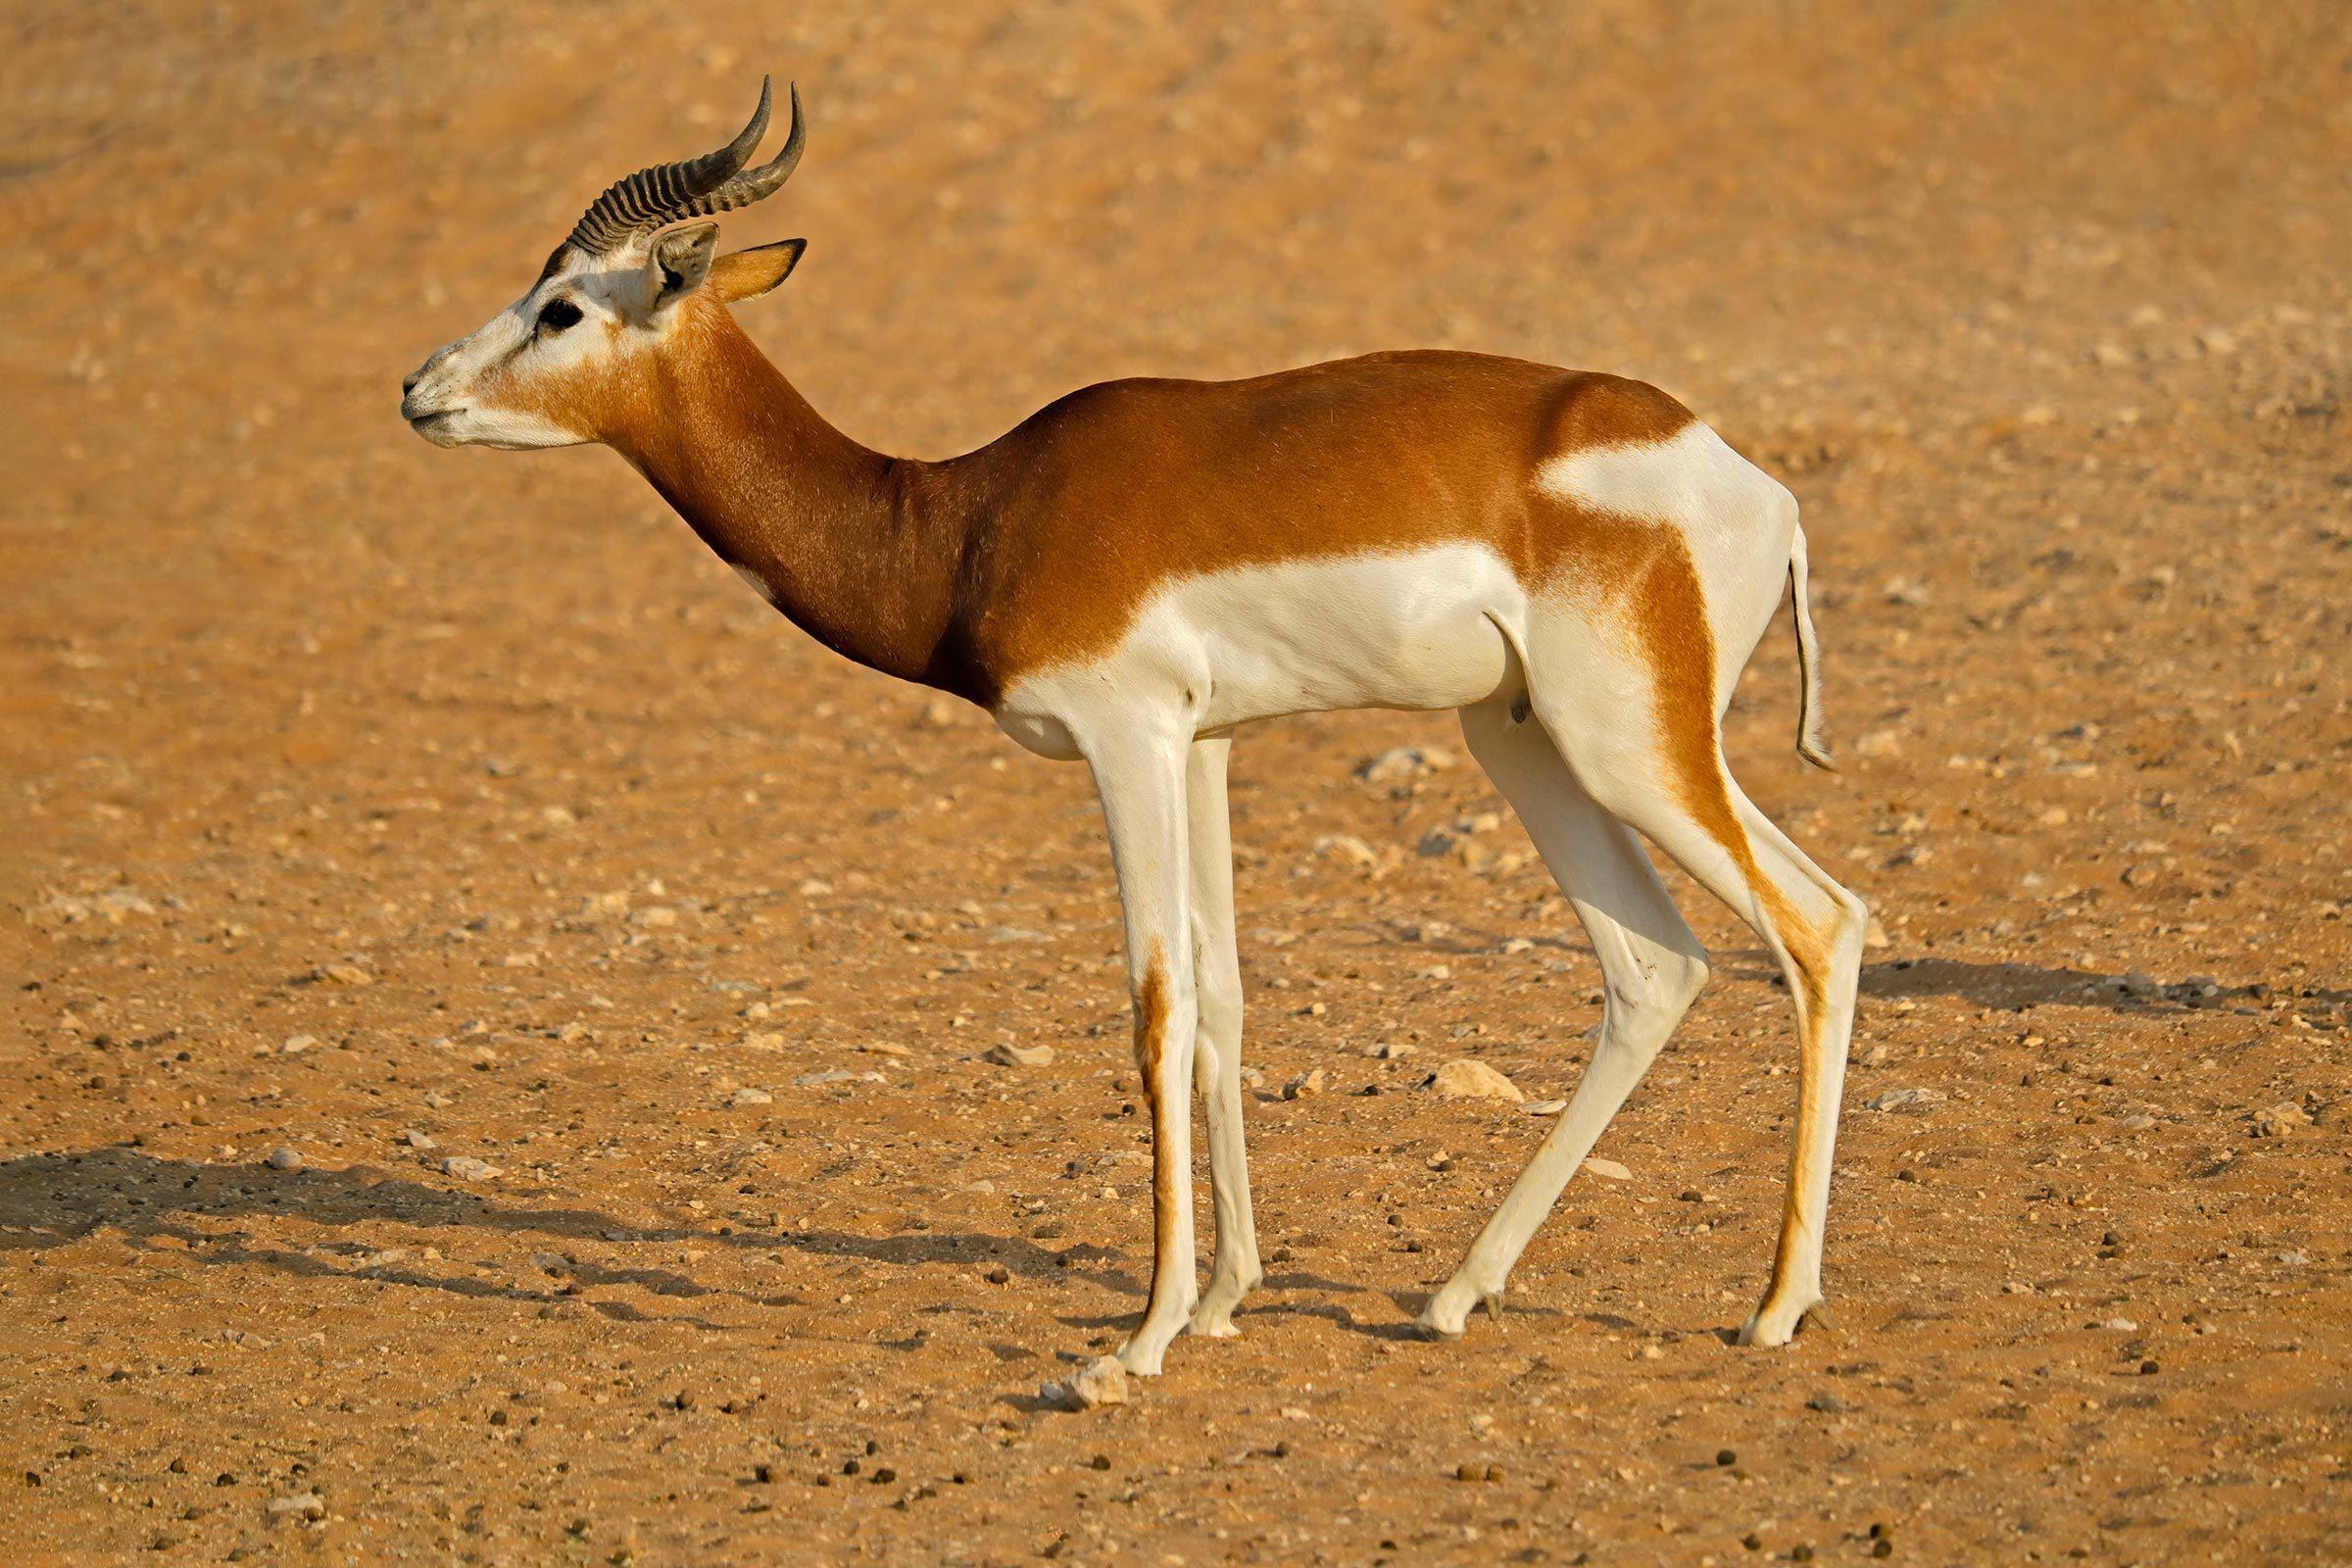 Espèces menacées : gazelle dama (Nanger dama)